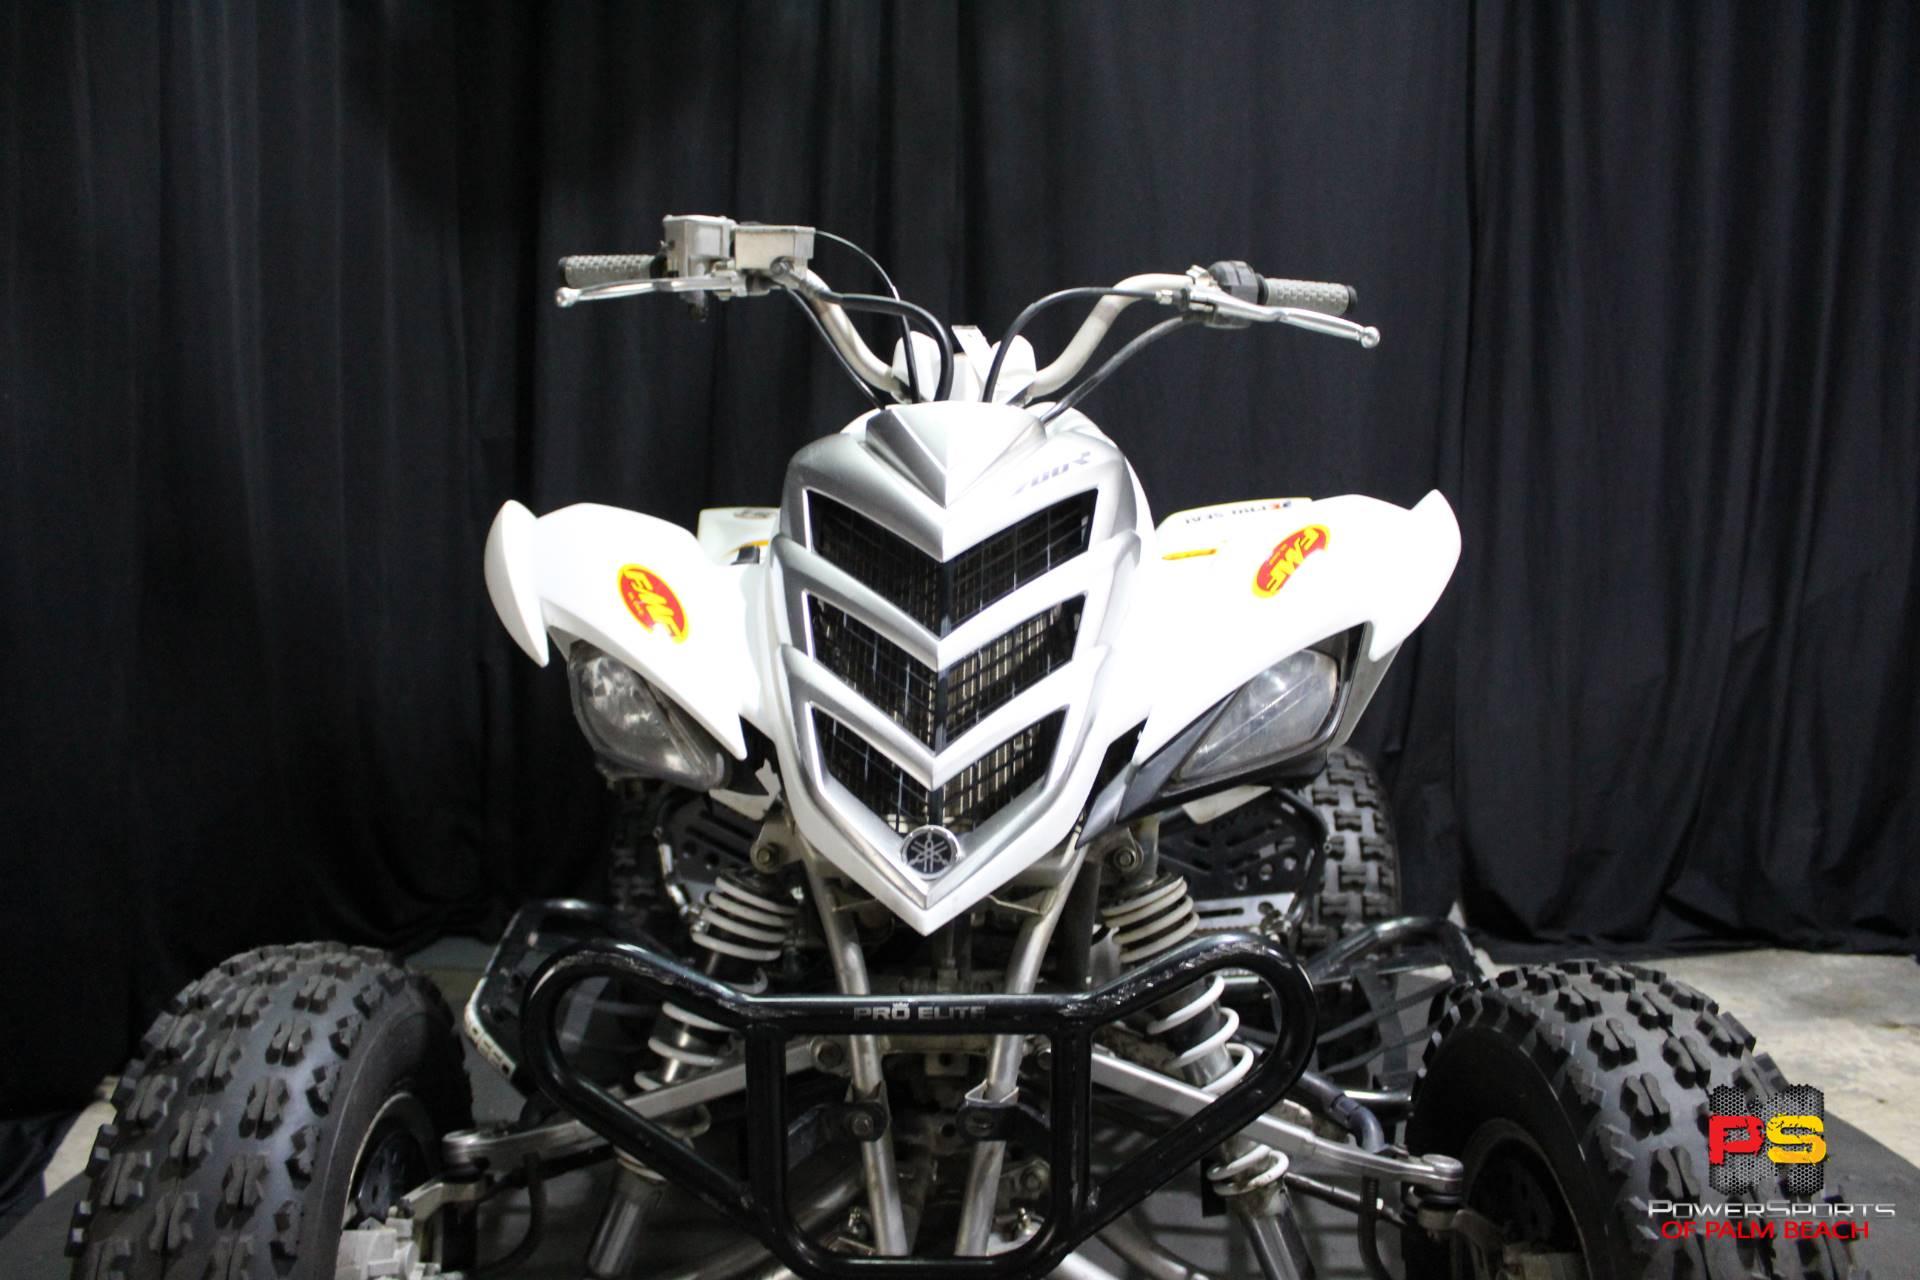 2006 Yamaha Raptor 700R 9